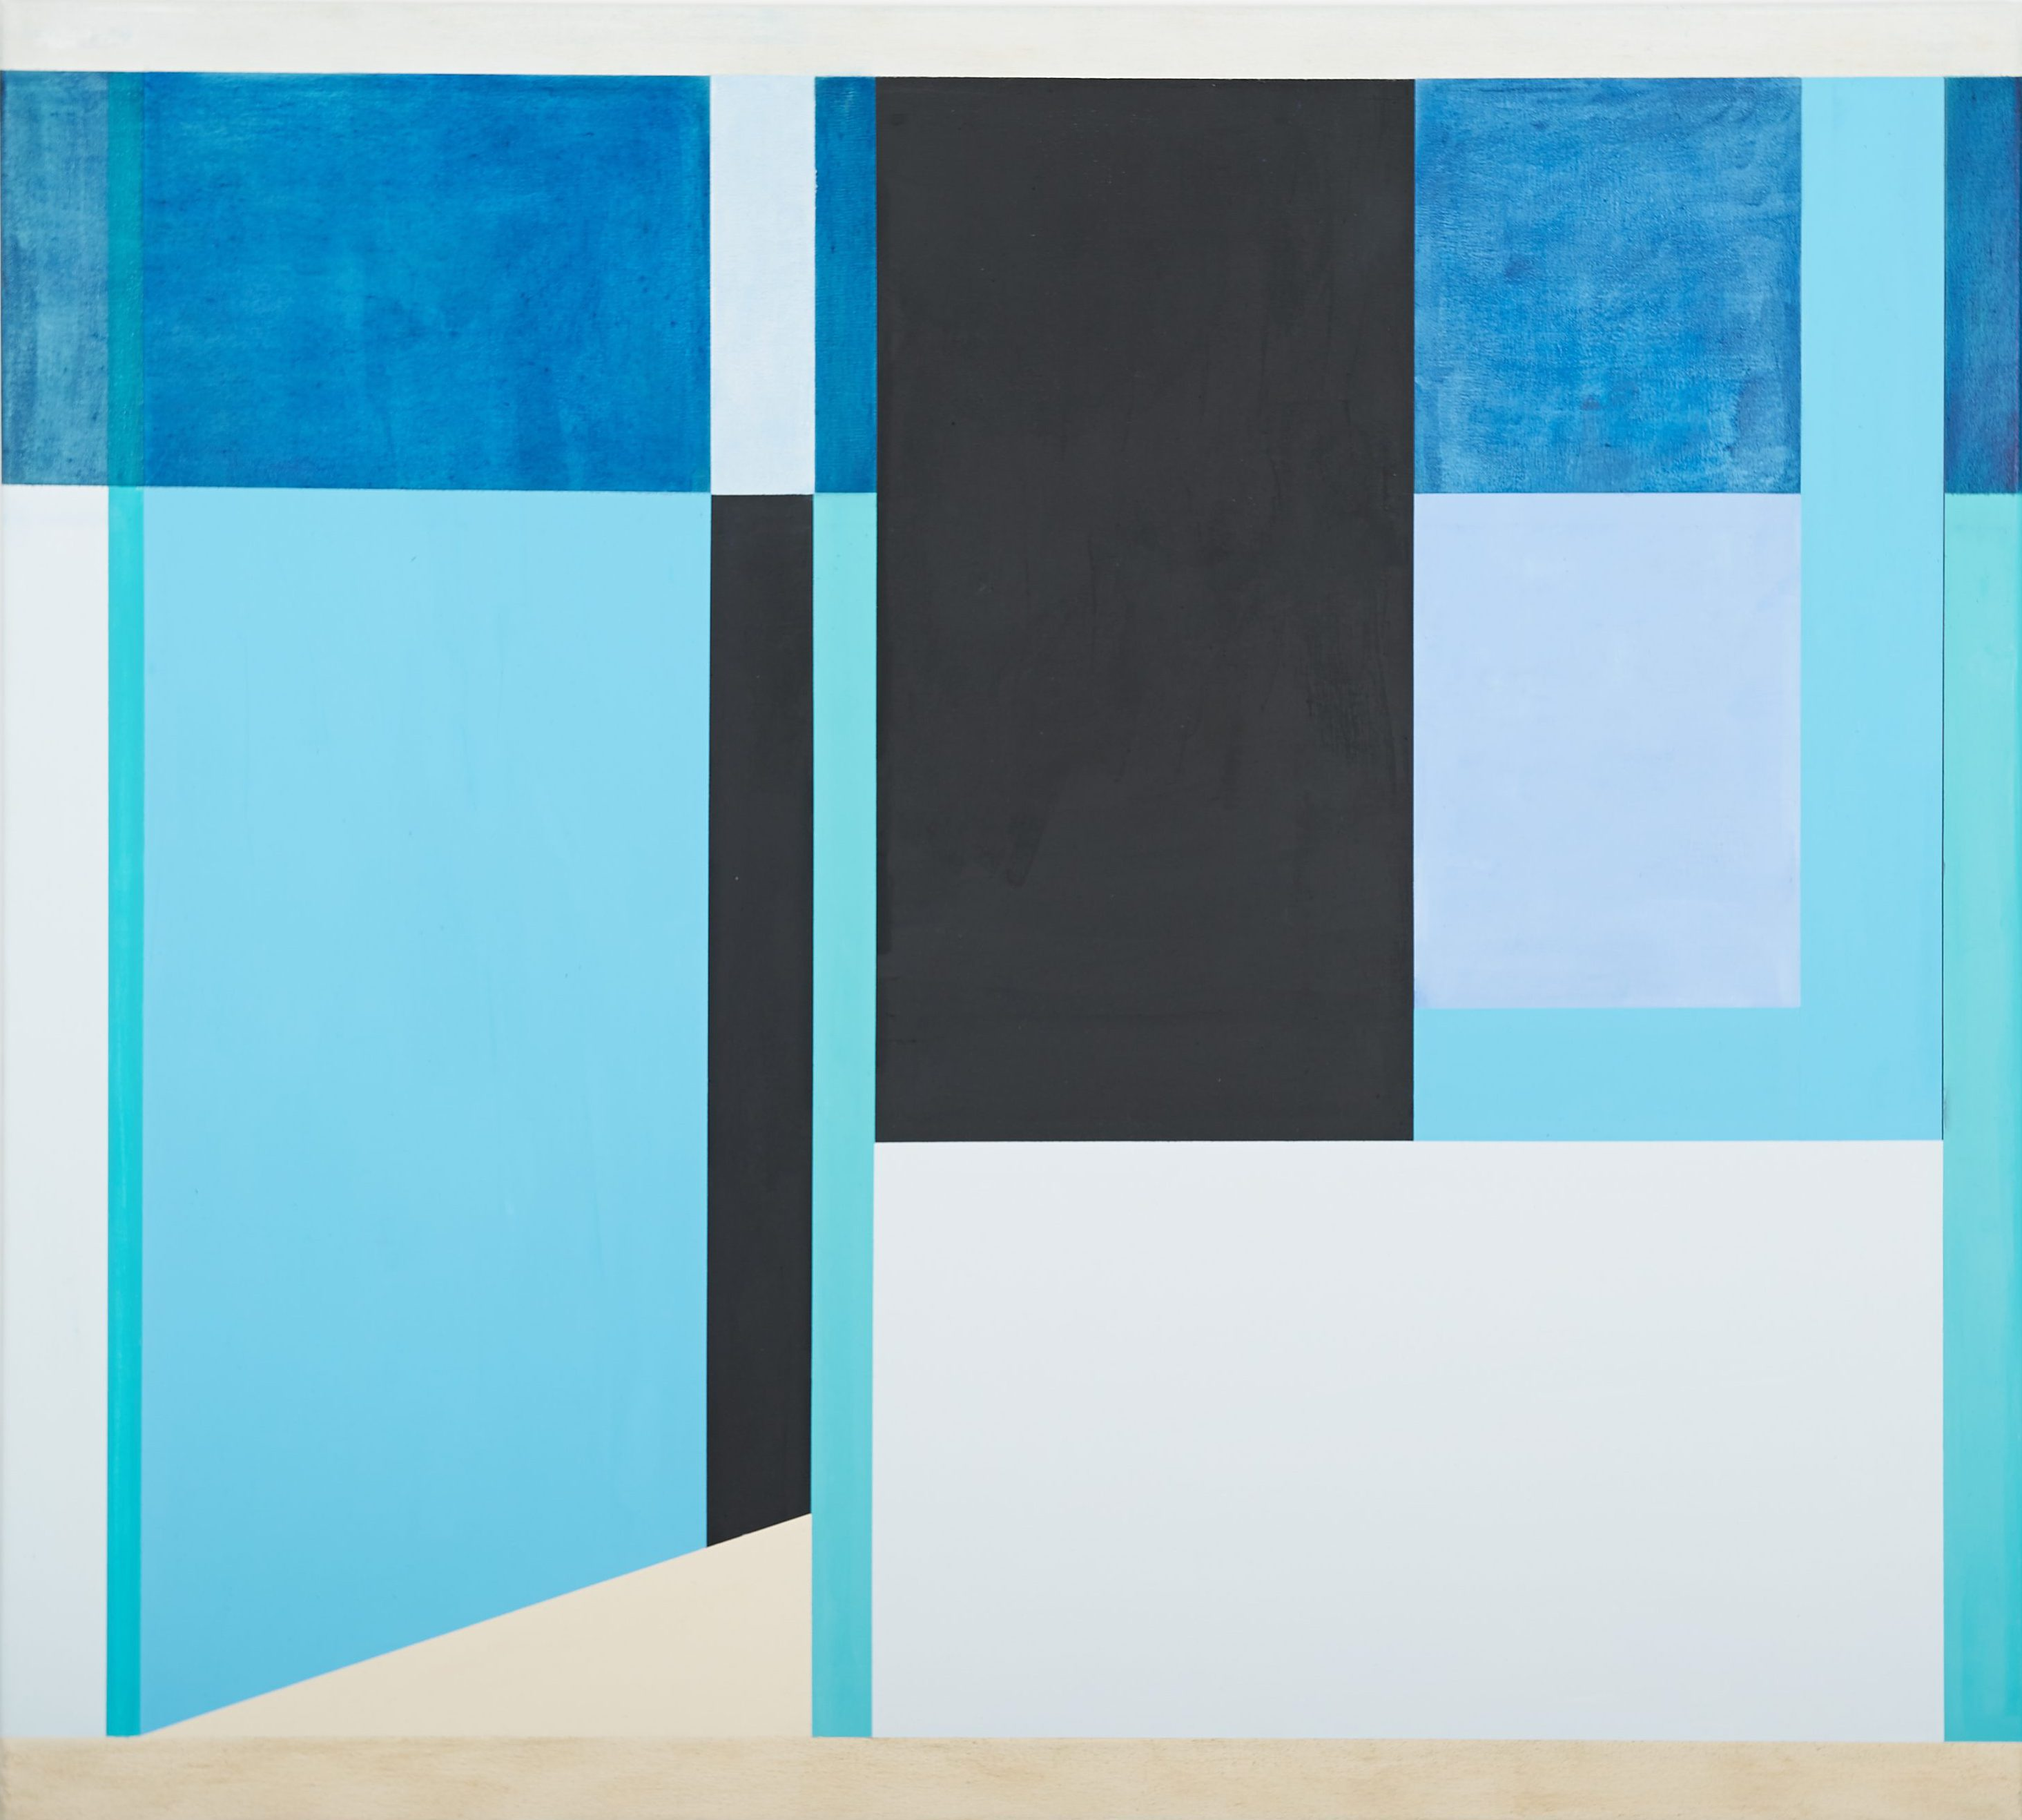 Am Meer I (Sulawesi), 2013, 90 x 100 cm, Öl/Lw. By the Sea I (Sulawesi), 2013, 90 x 100 cm, Oil on canvas